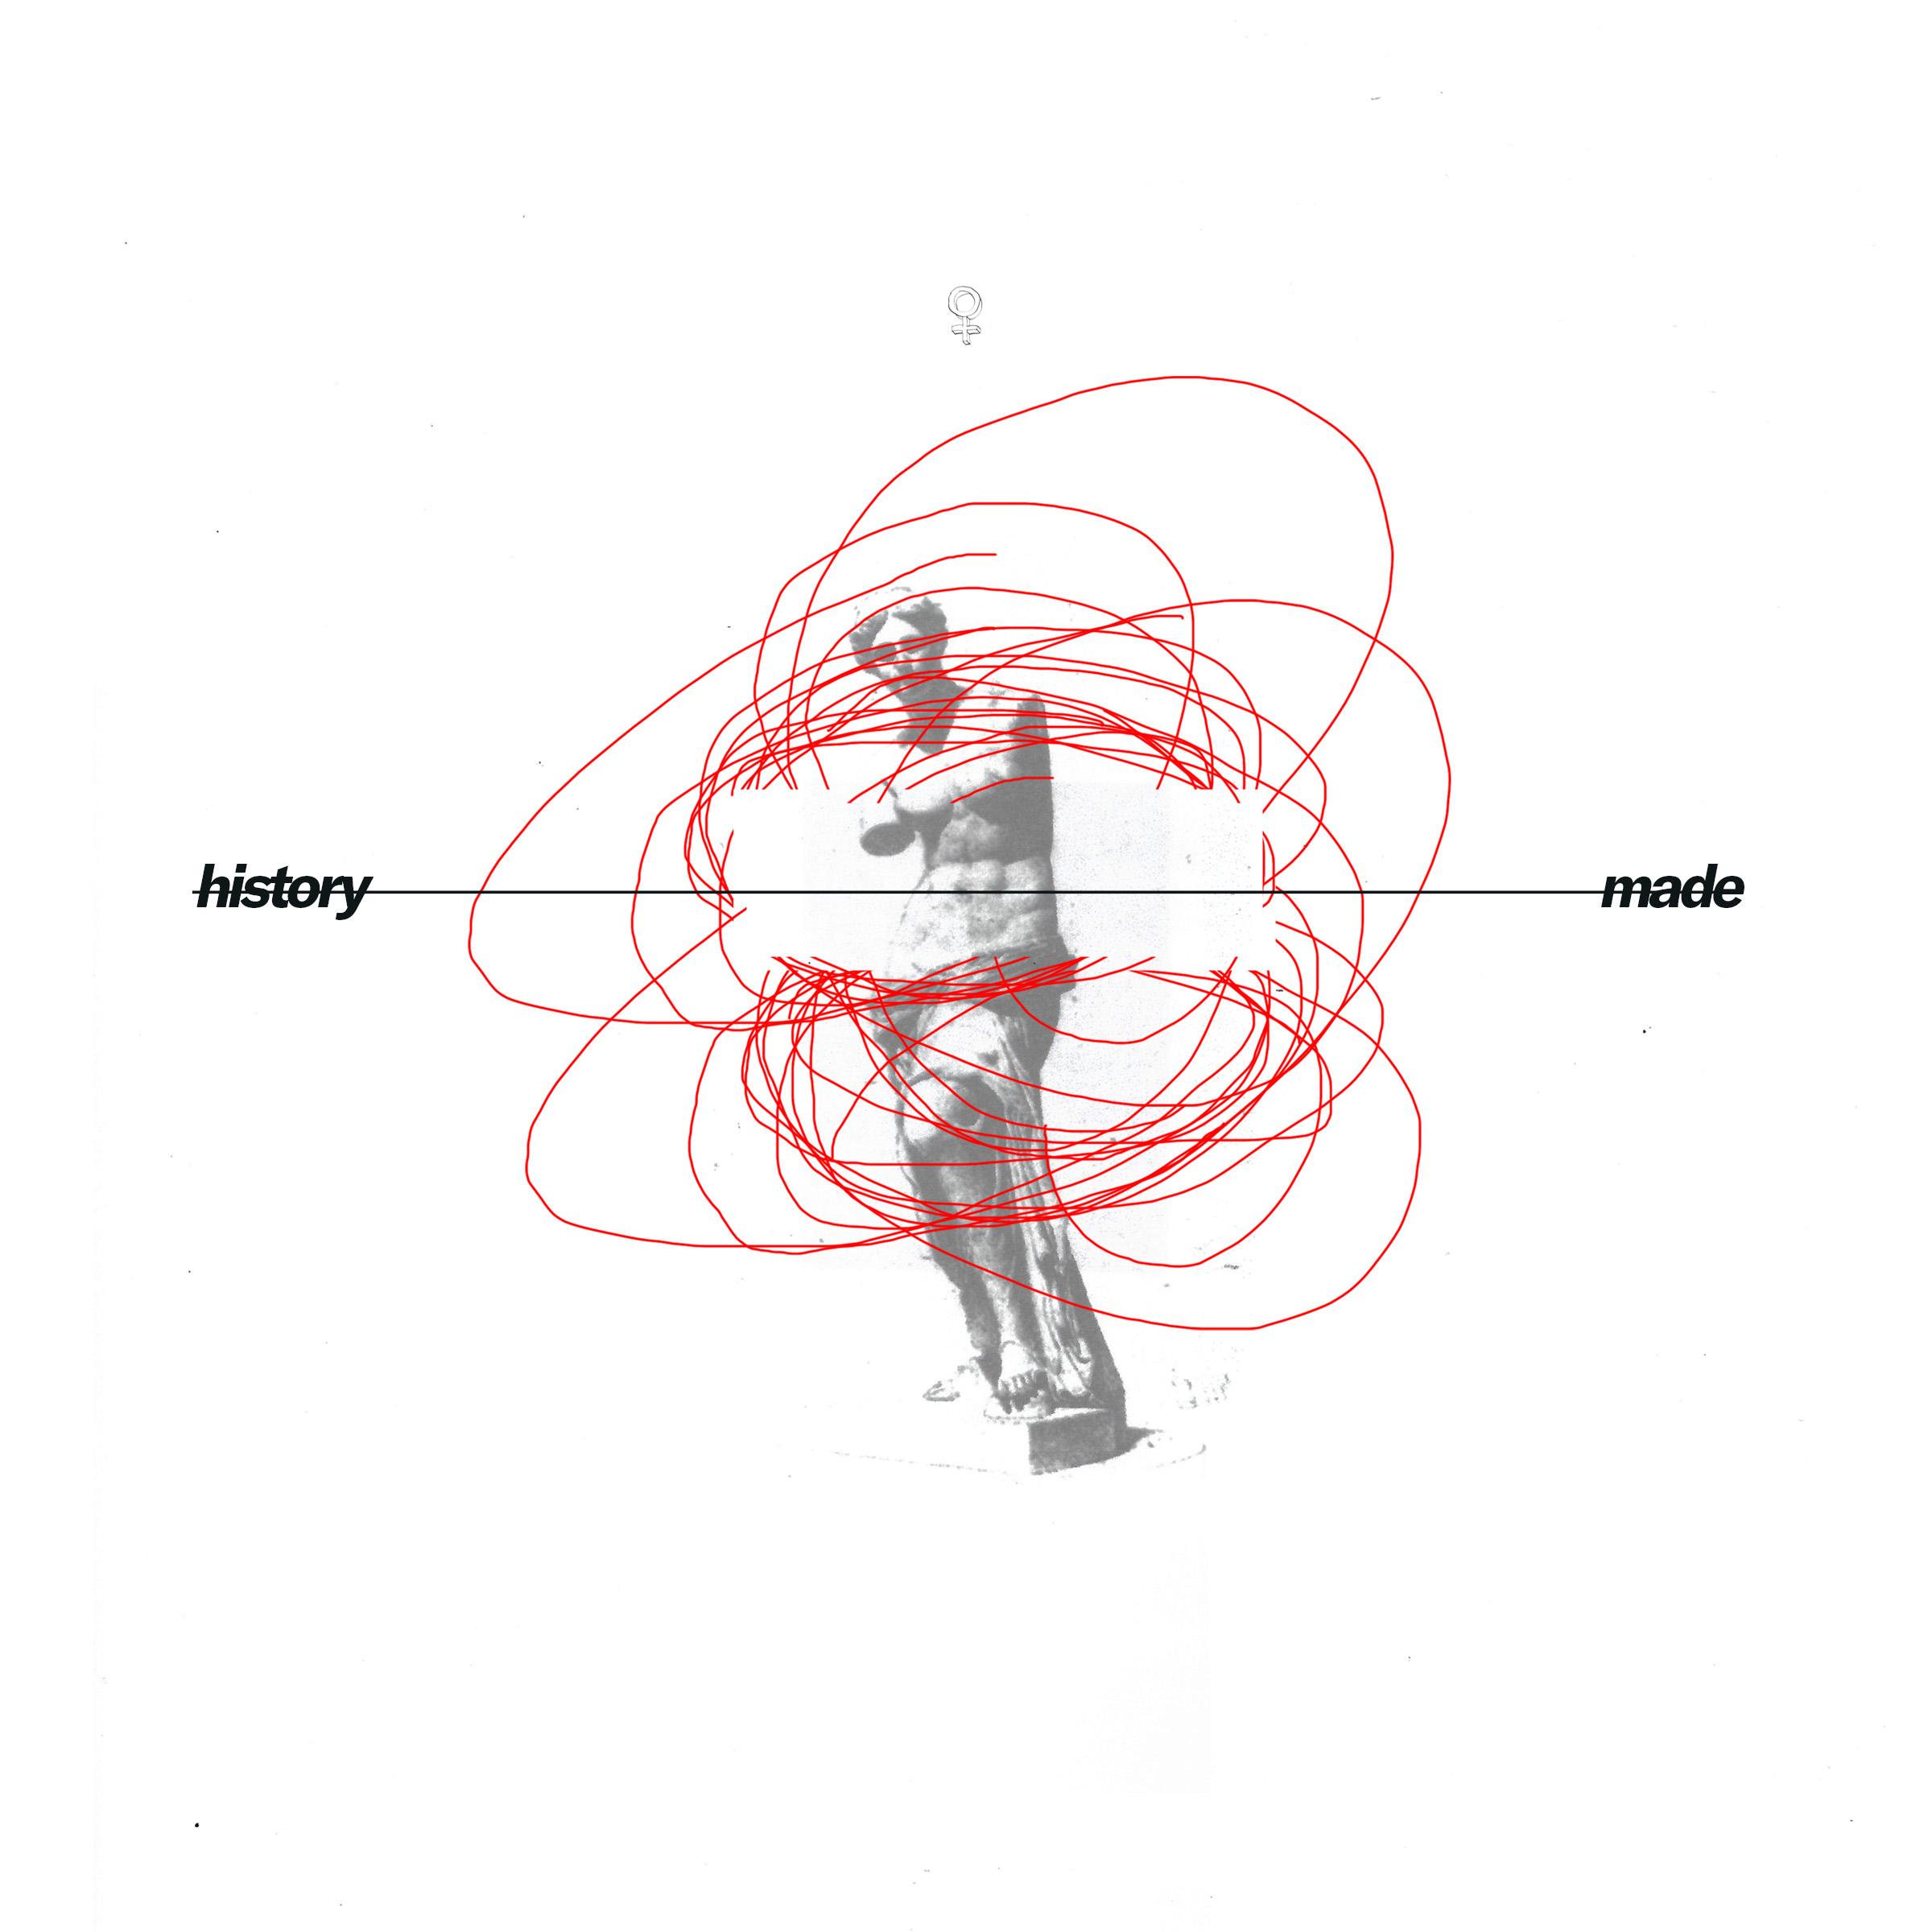 Paradisia - History Made - cover artwork by Anna pesquidous.jpg